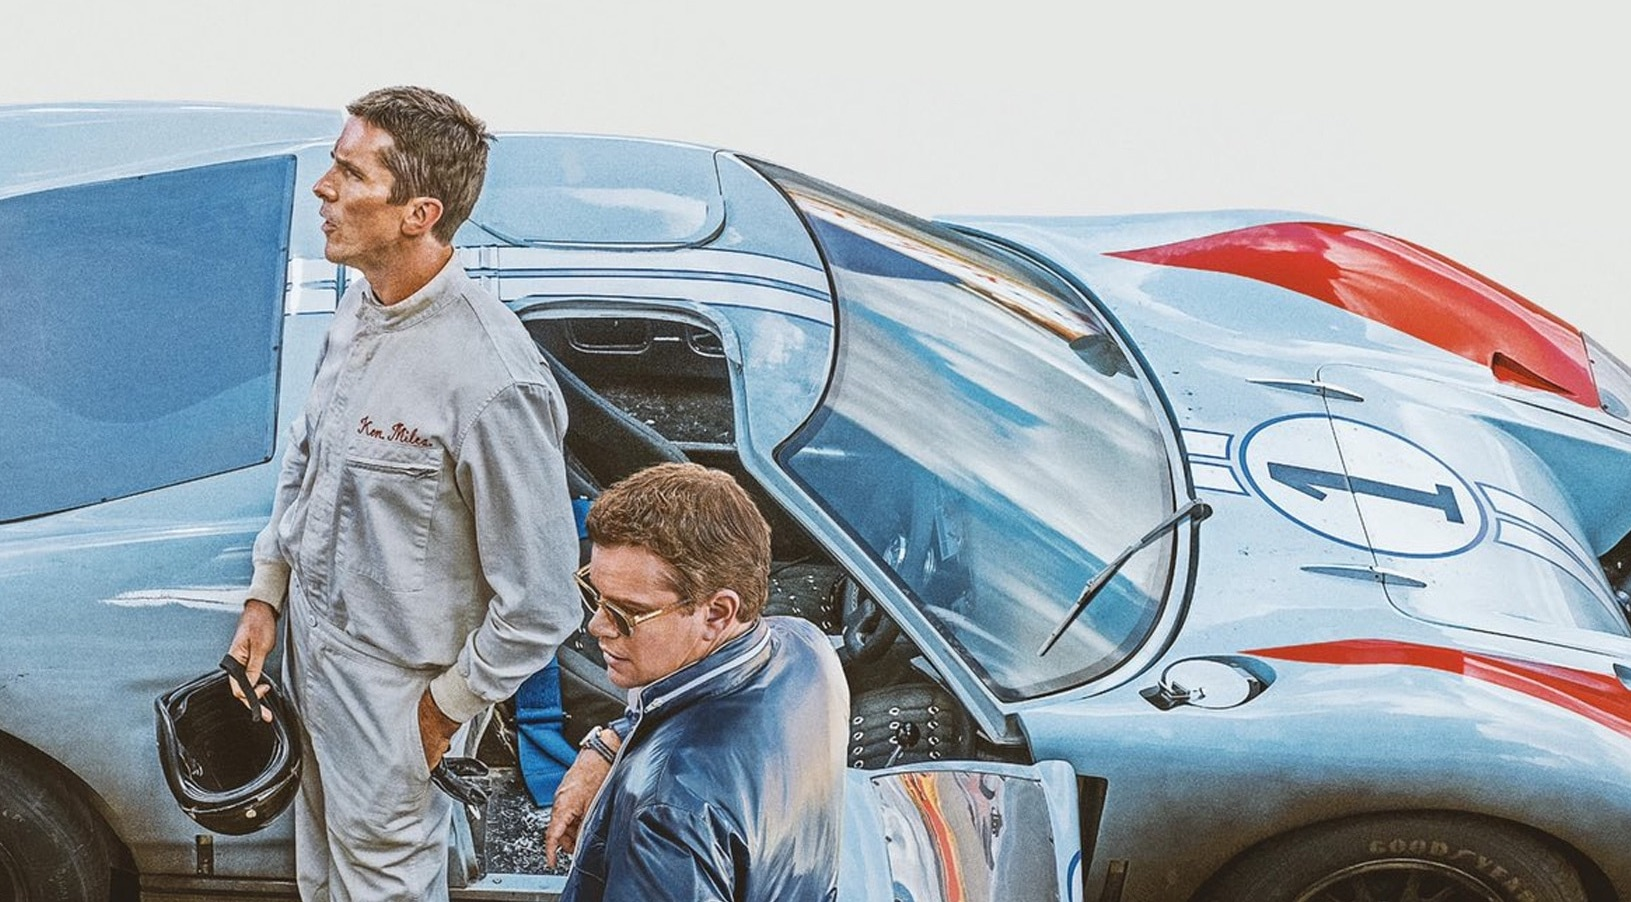 Explicación de la verdadera historia detrás de 'Ford vs Ferrari' 2